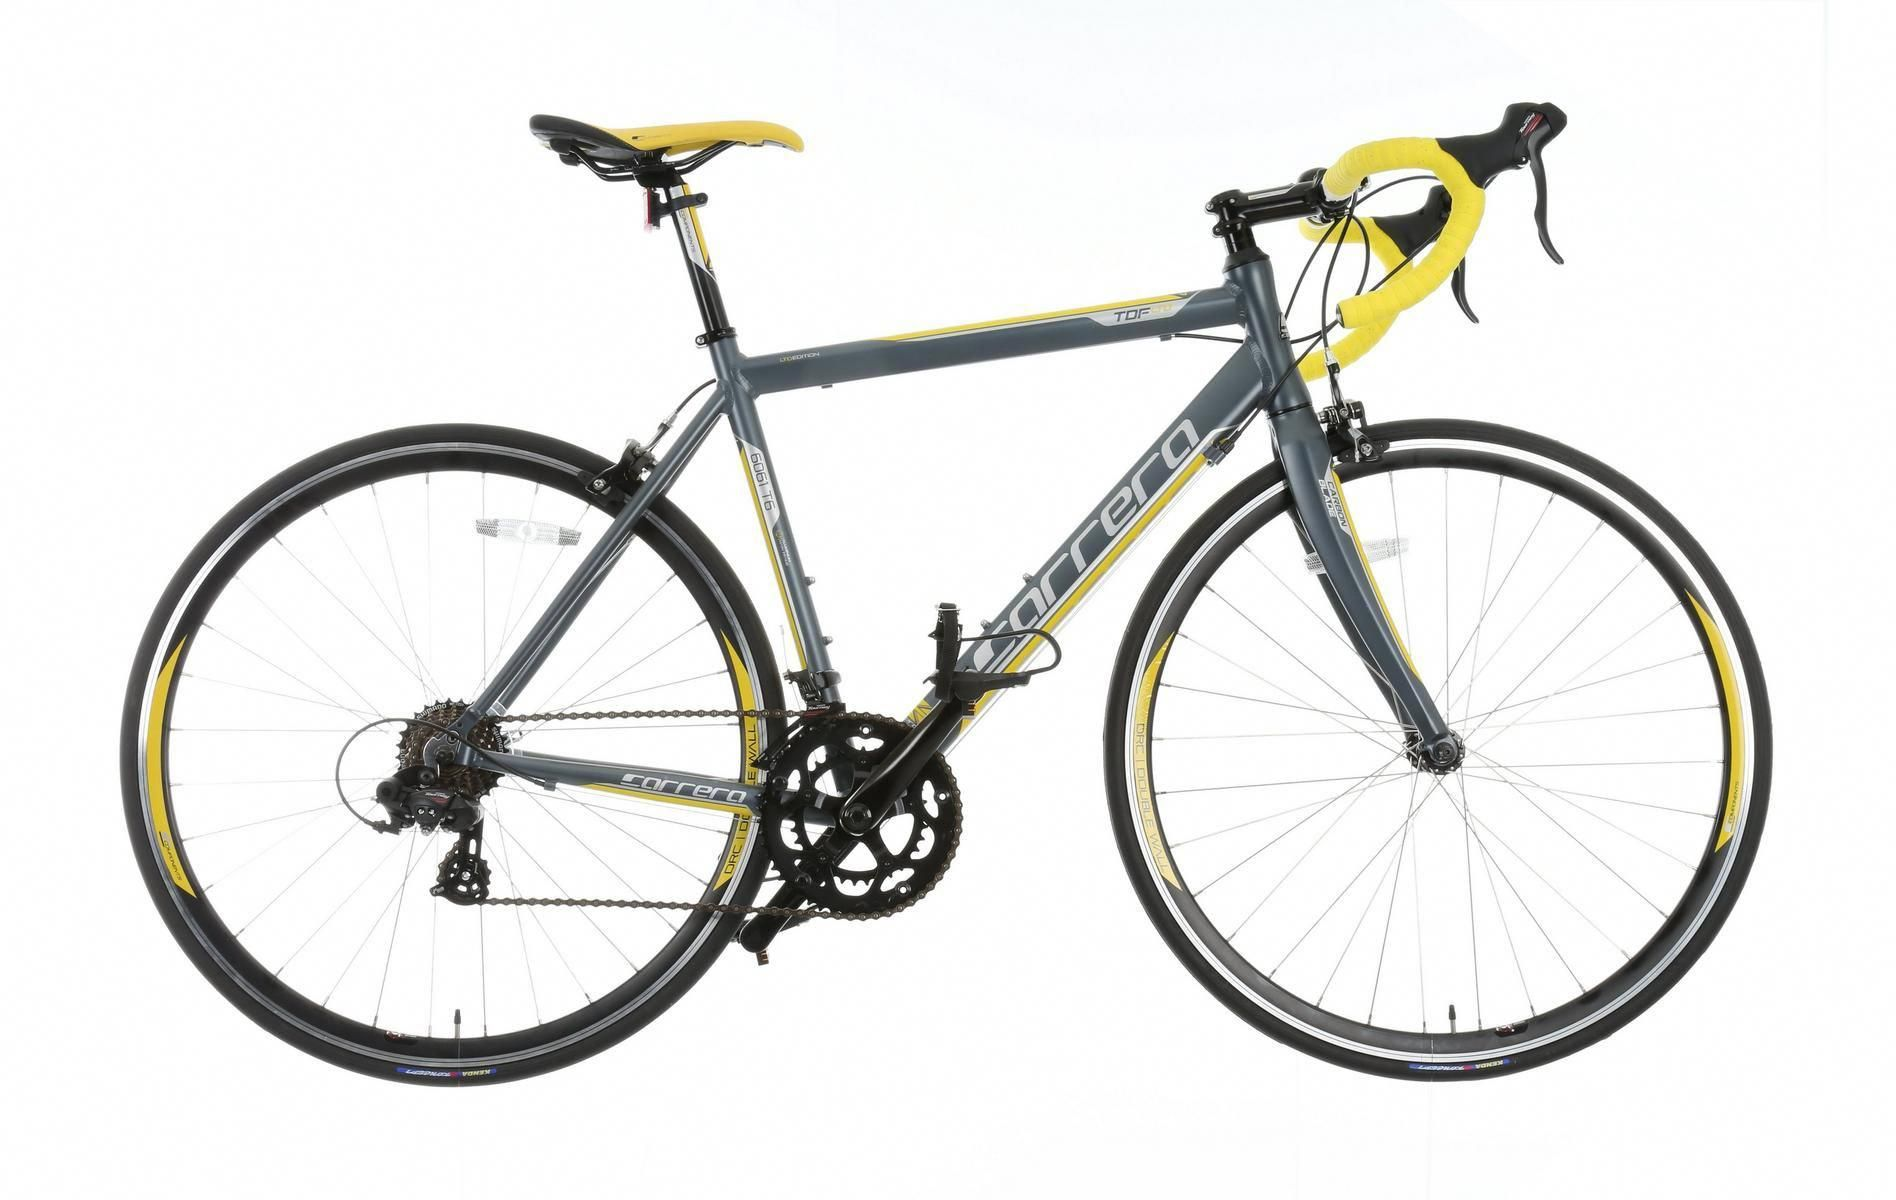 Types Of Bikes Racing Bikes Bike Road Racing Bike